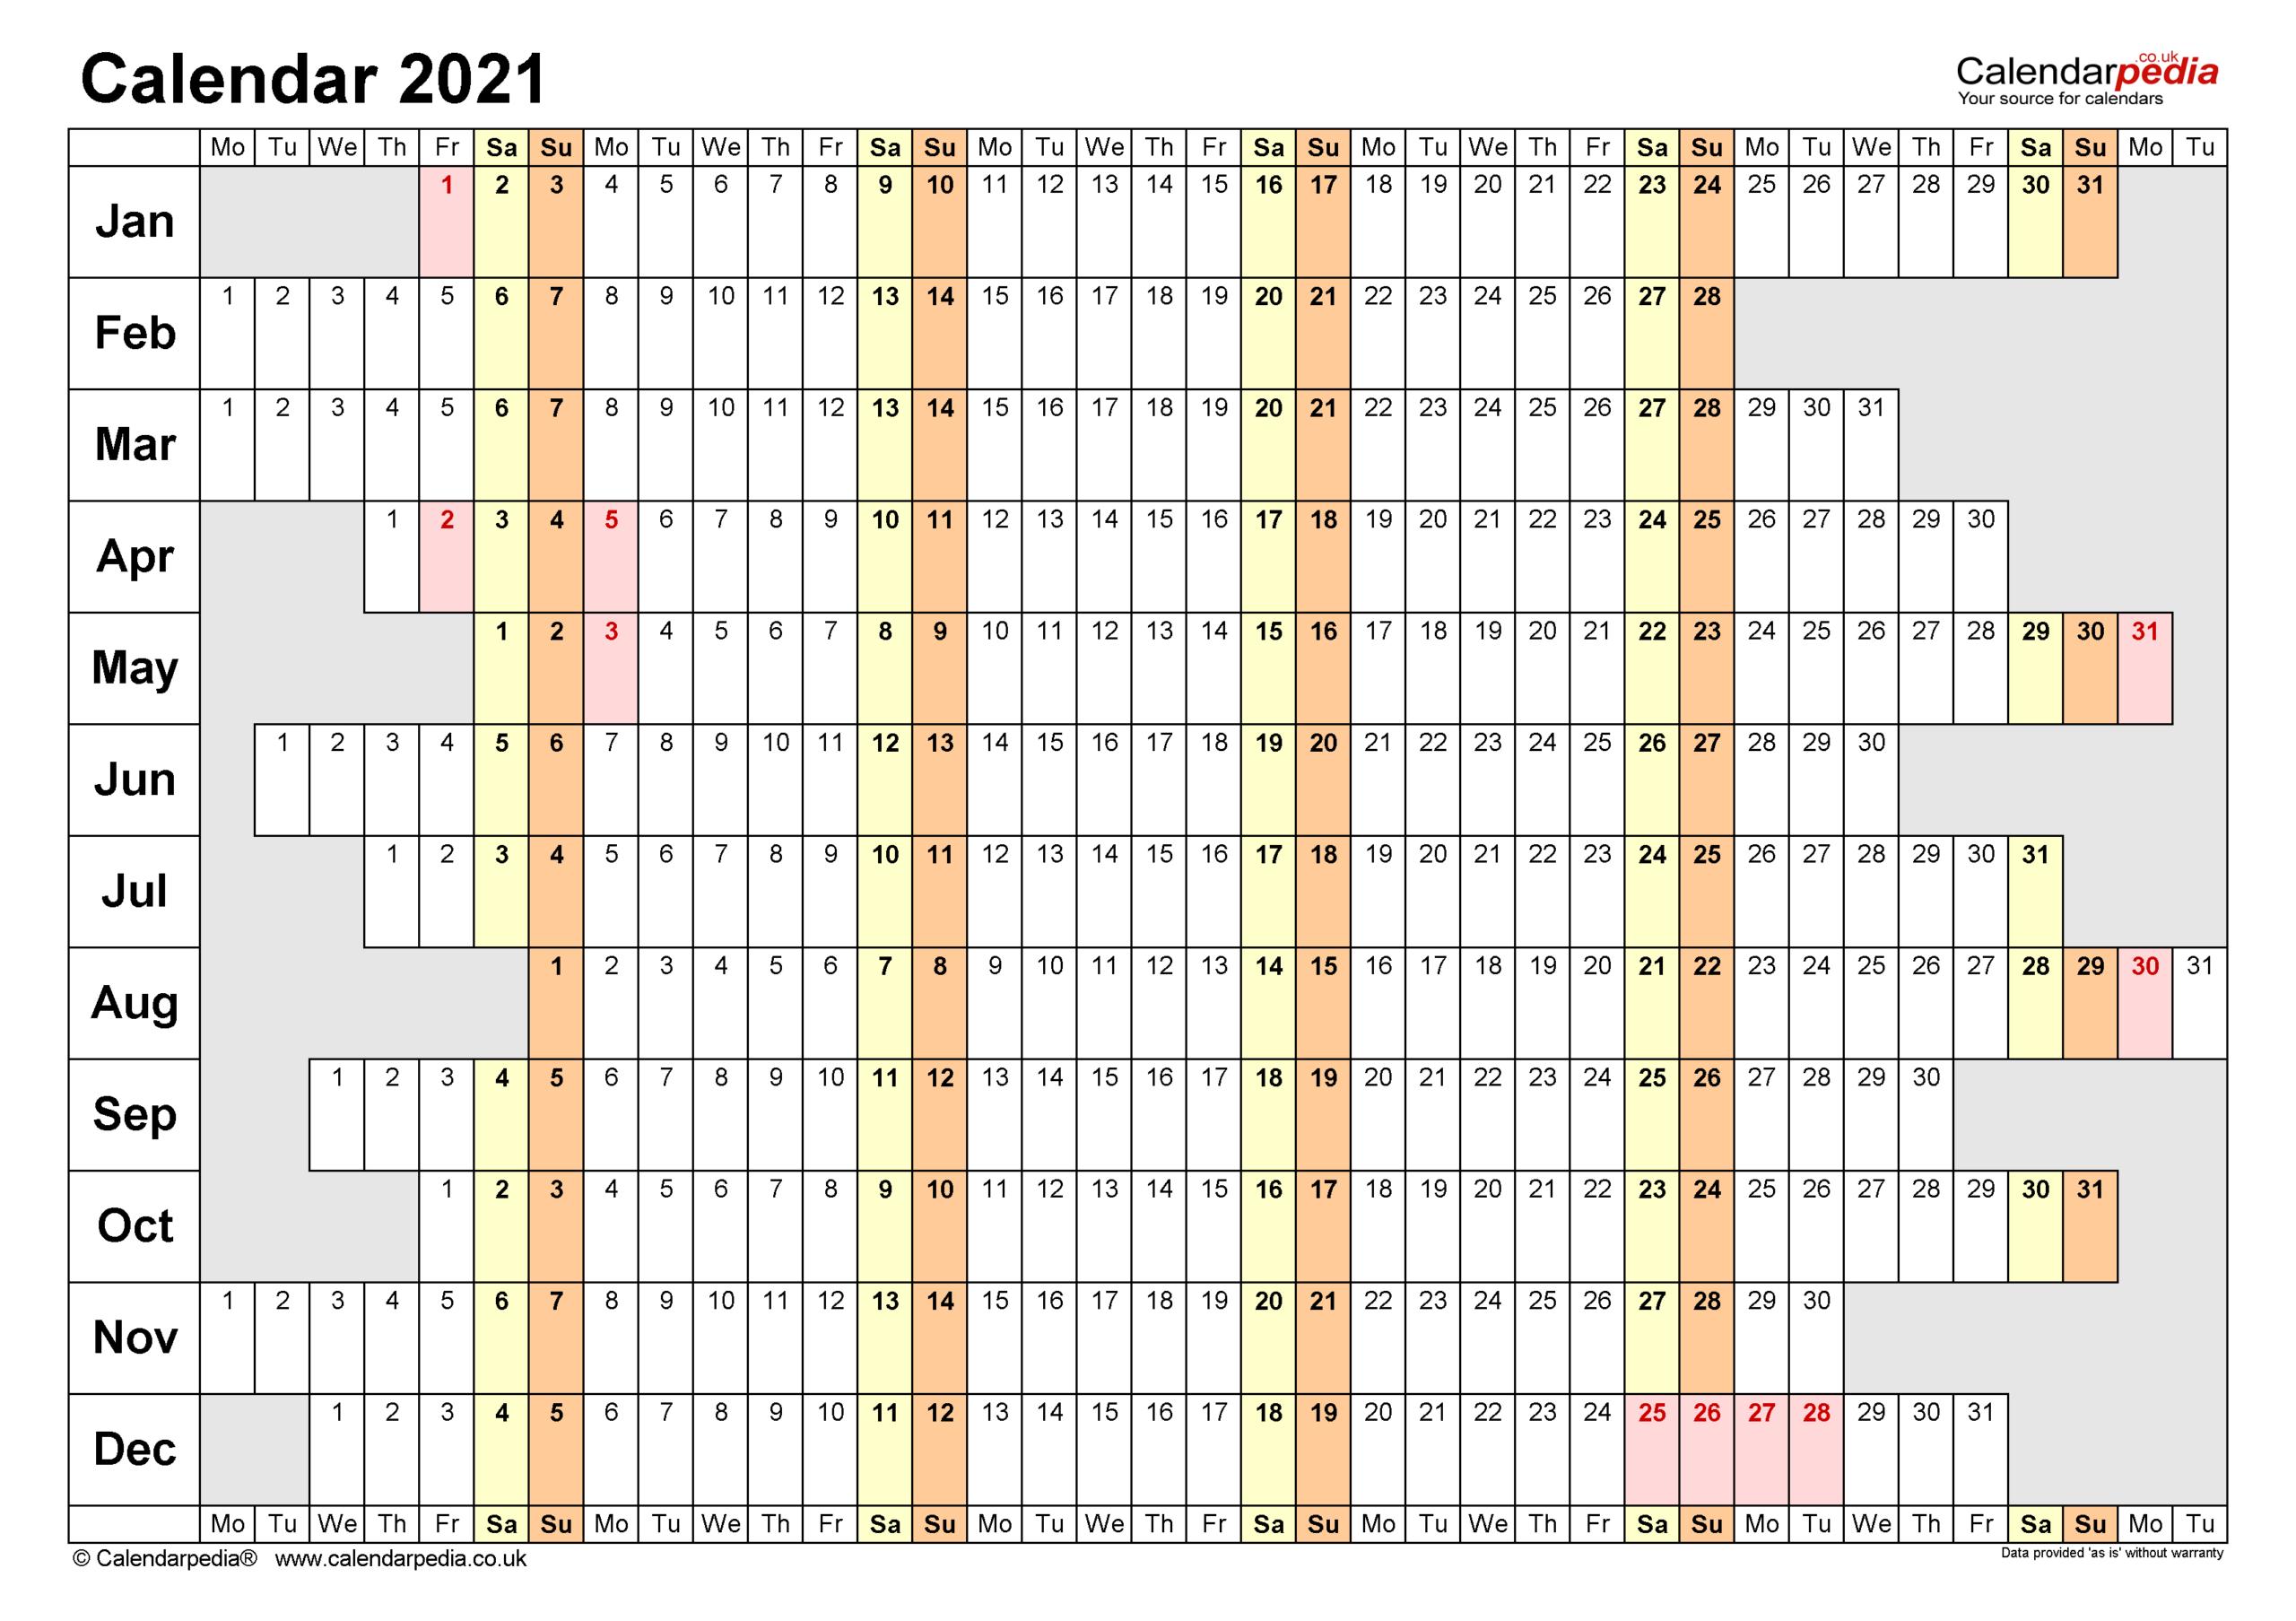 Calendar 2021 (Uk) - Free Printable Microsoft Word Templates with regard to 2021 Shift Calendar Free